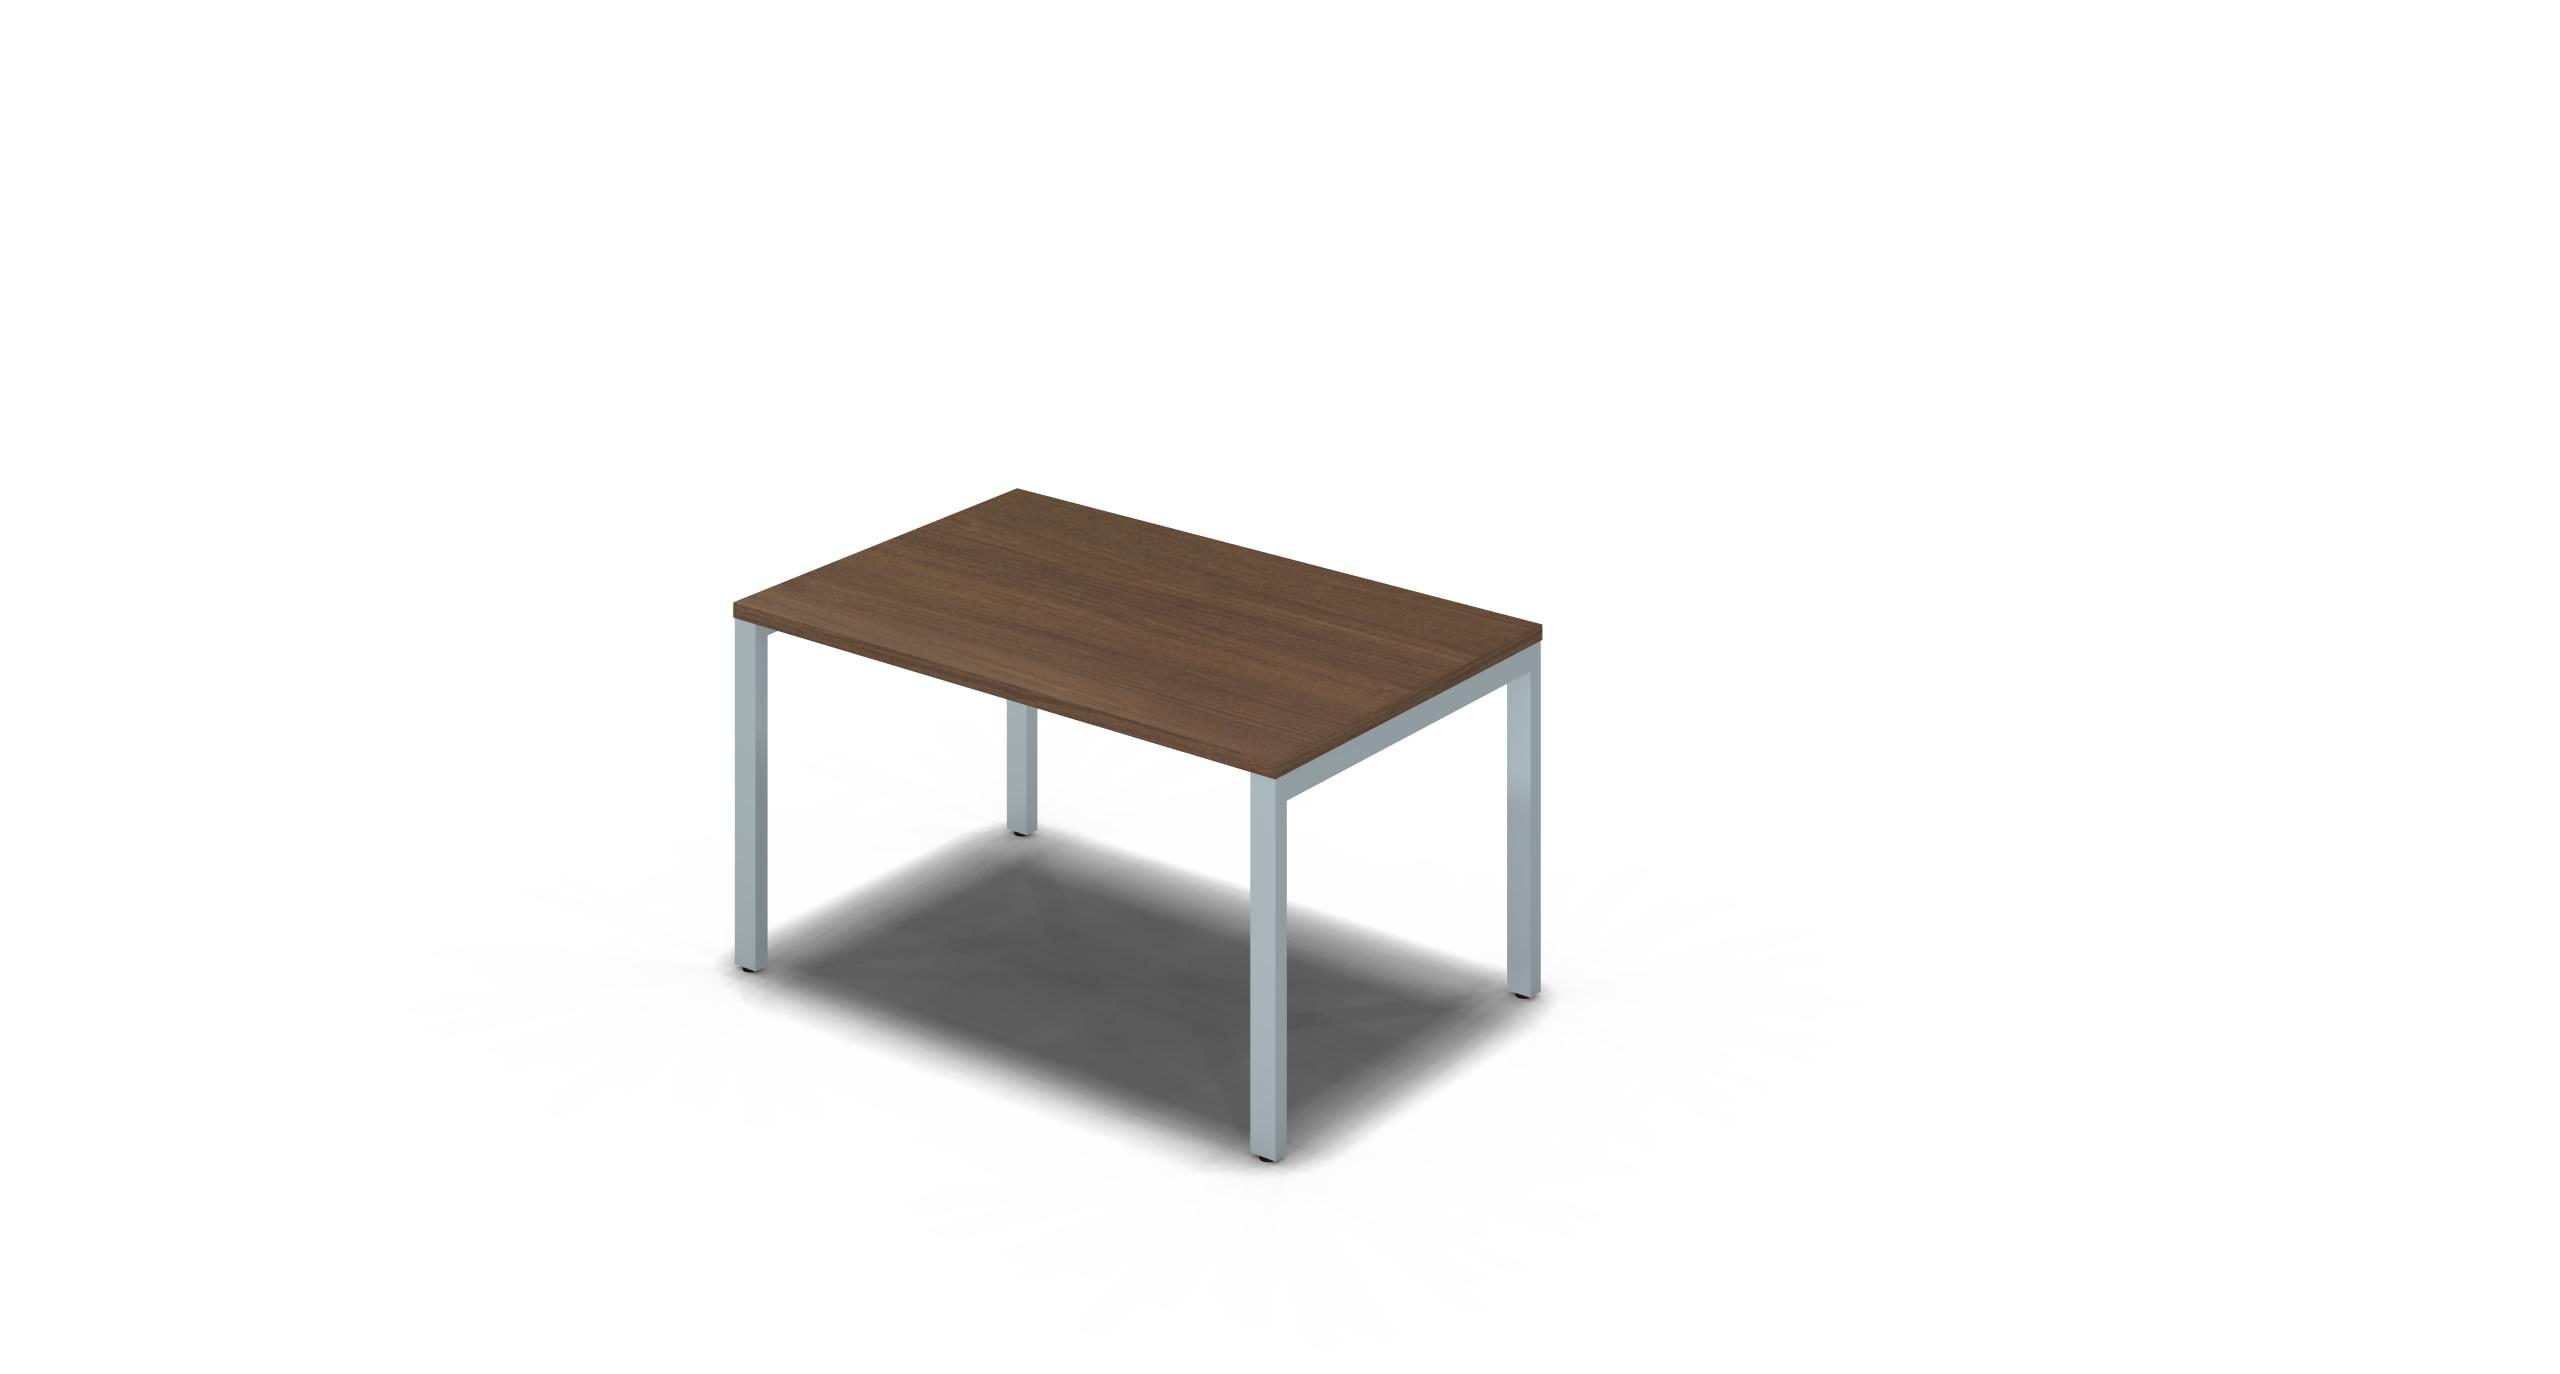 Table_Square_1200x750_Silver_Walnut_noOption